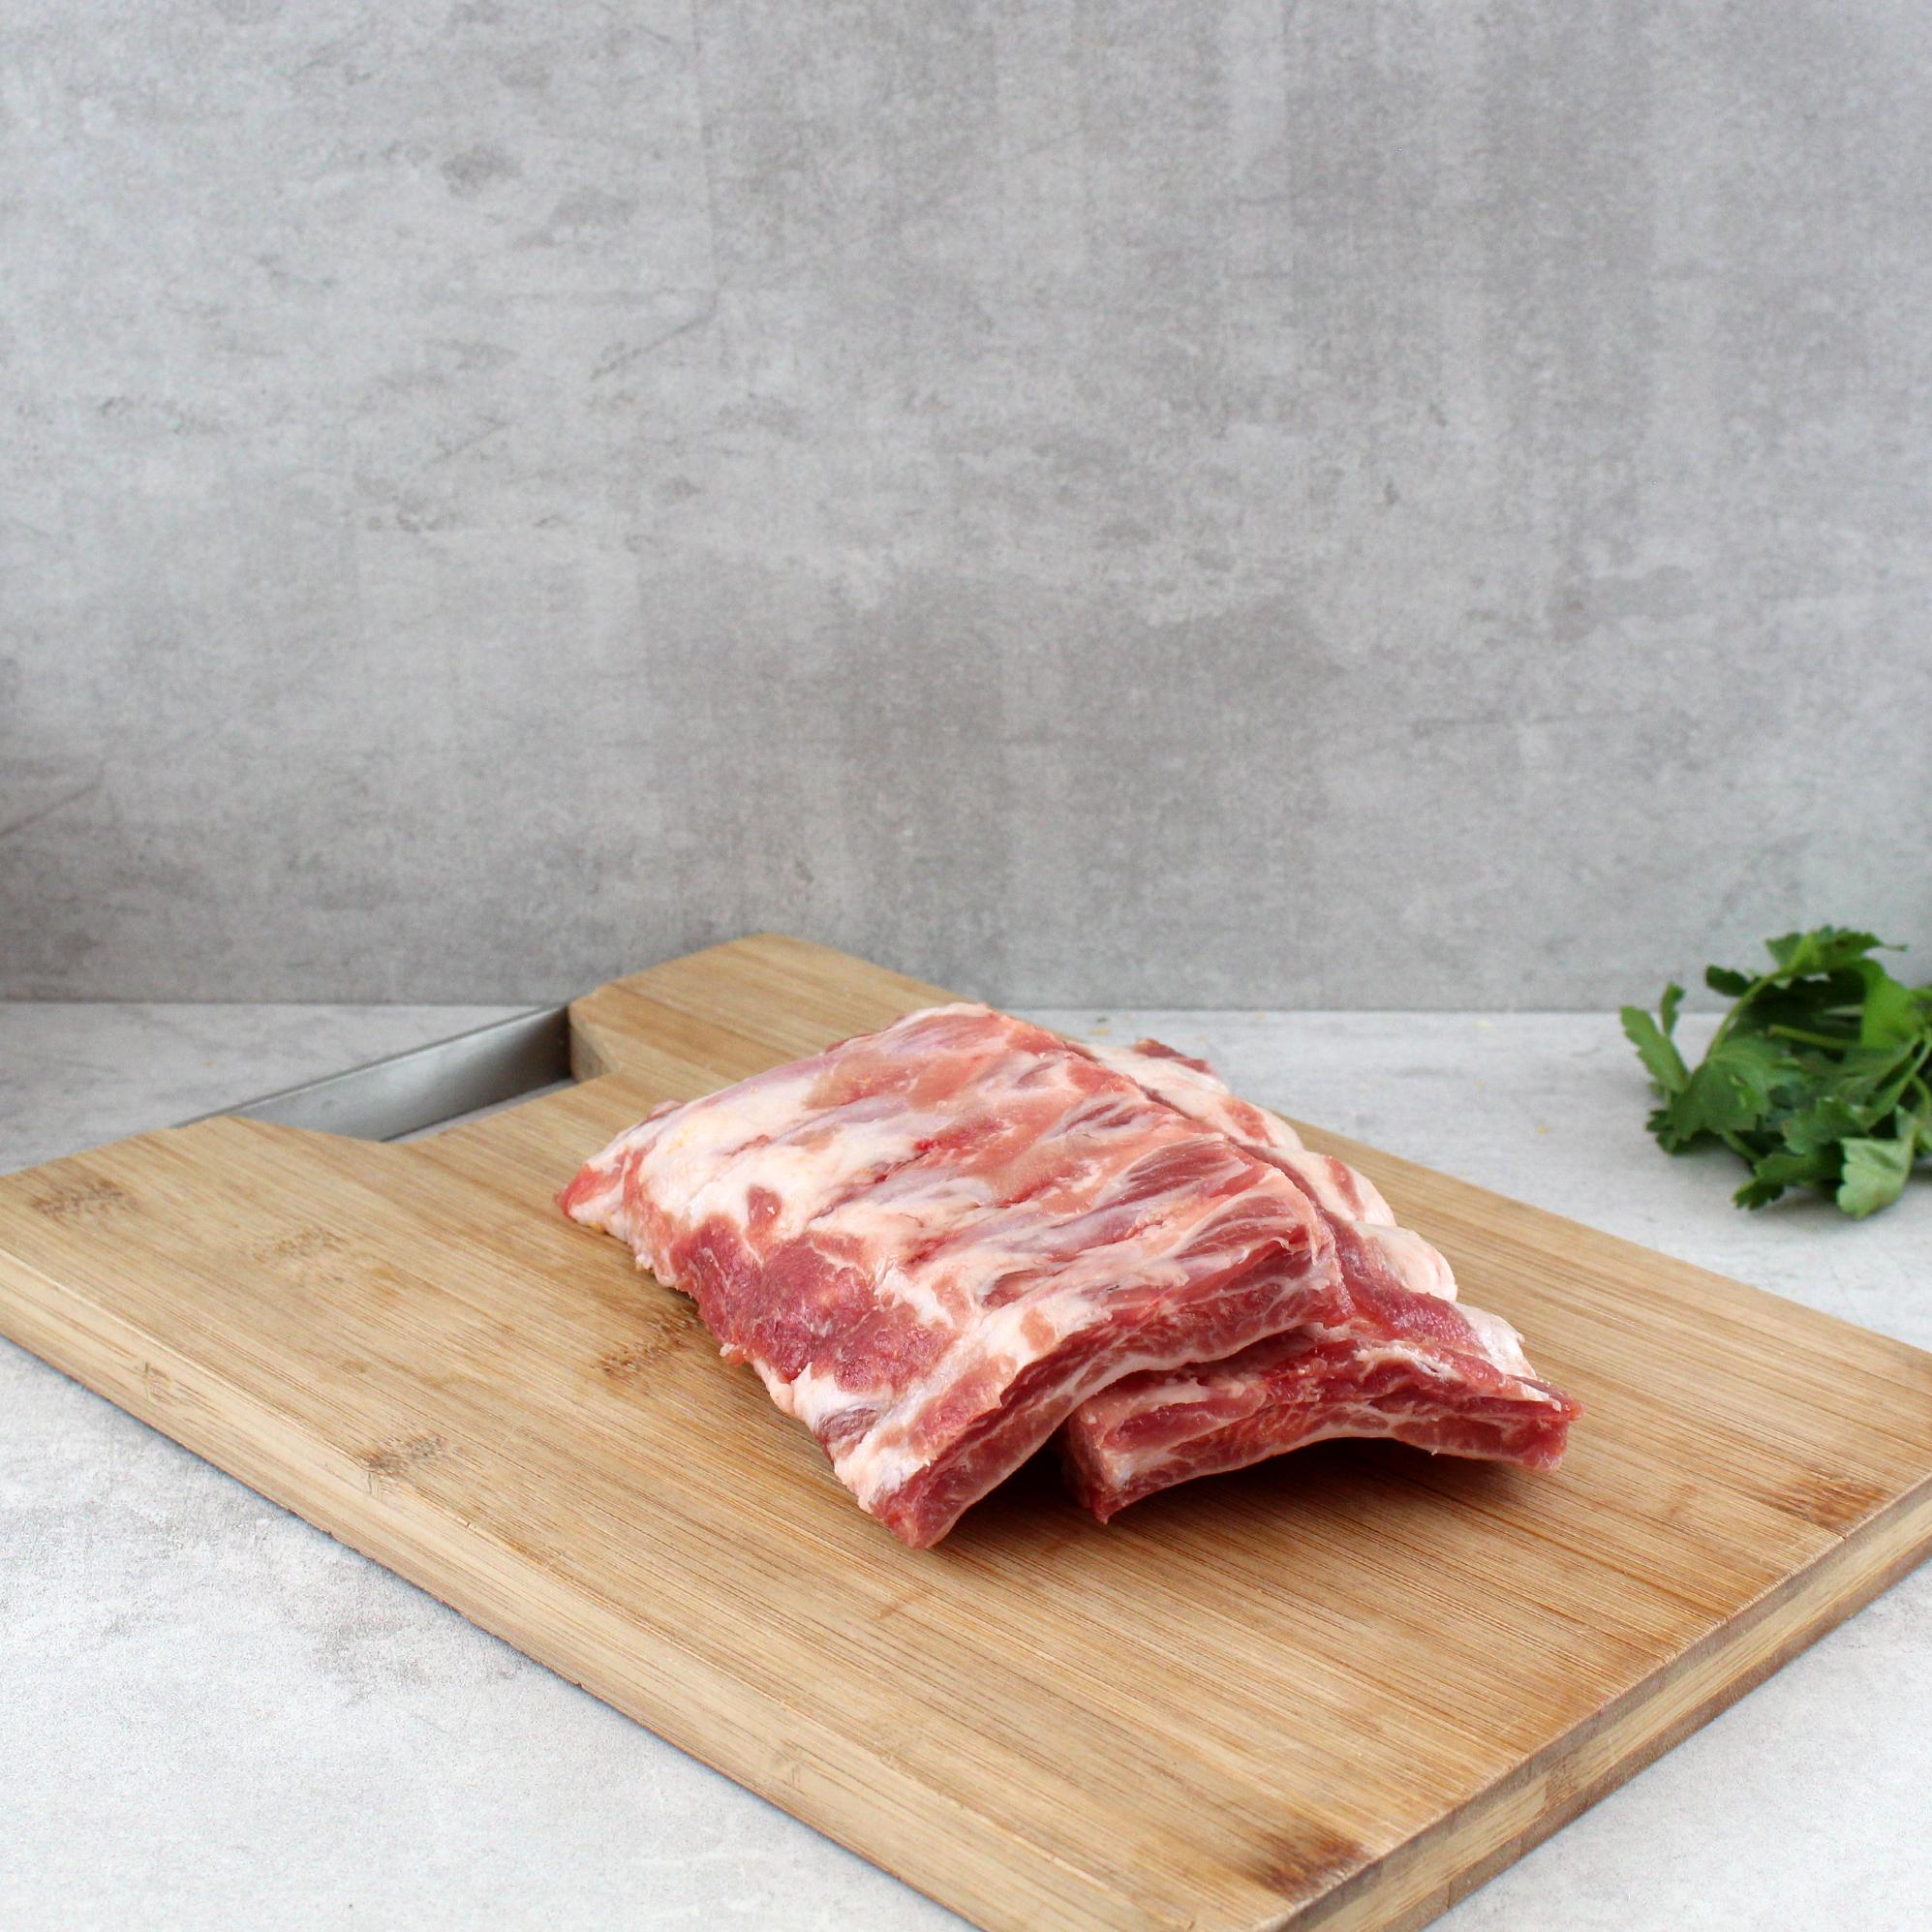 tk-iberico-spare-ribs-ca.-1-13-kg---stk.-1-stk.---paeck.-markthalle20-1